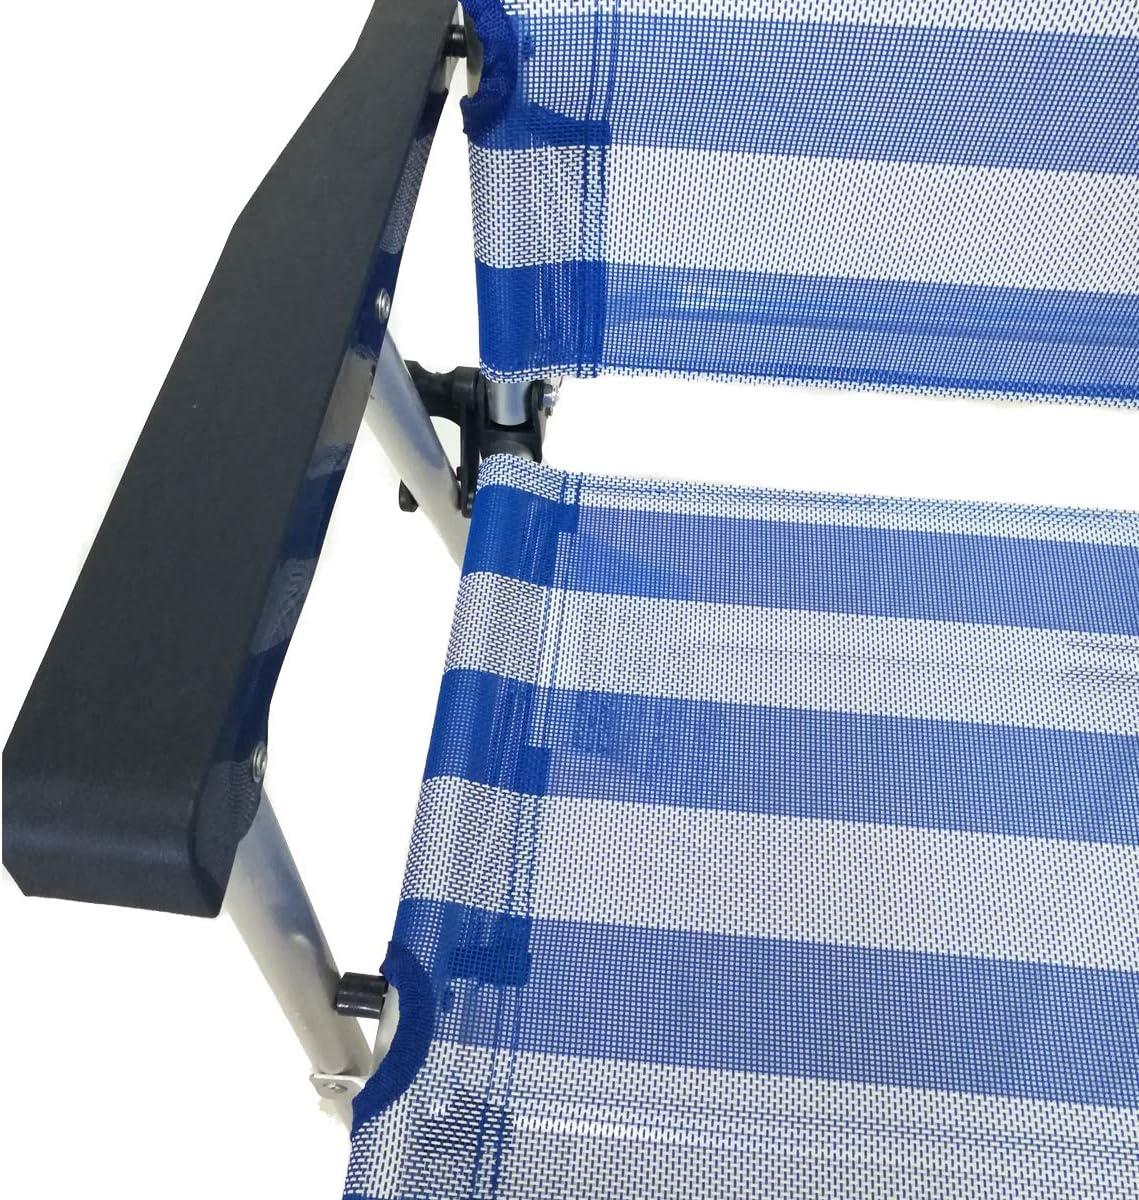 jard/ín o Exteriores Tumbona Plegable de Aluminio con reposabrazos para Playa S.L Silla Plegable Medidas 56x56 cm Asiento Patio Cisne 2013 Color Rayas Azules